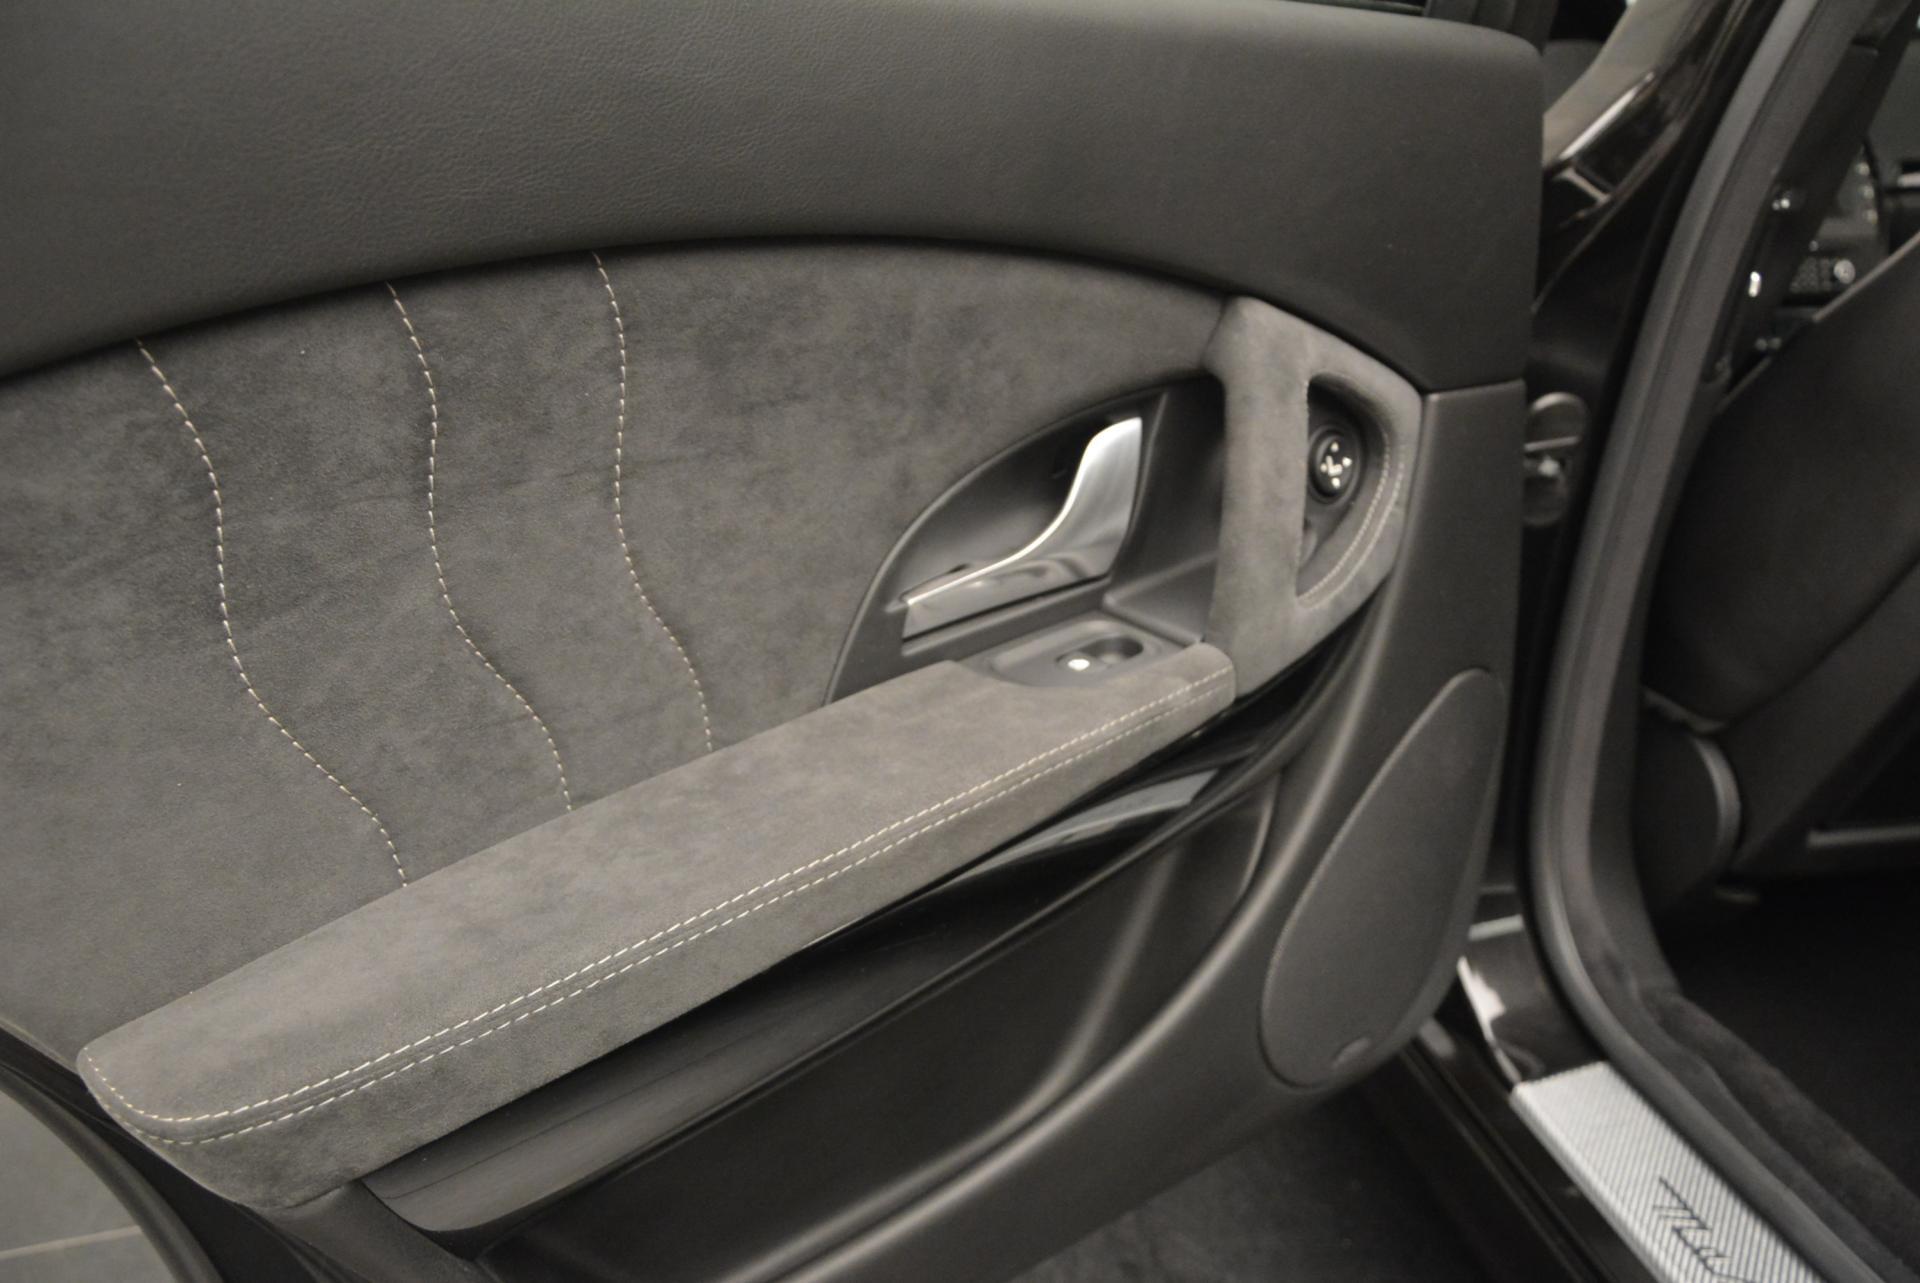 Used 2011 Maserati Quattroporte Sport GT S For Sale In Westport, CT 531_p17